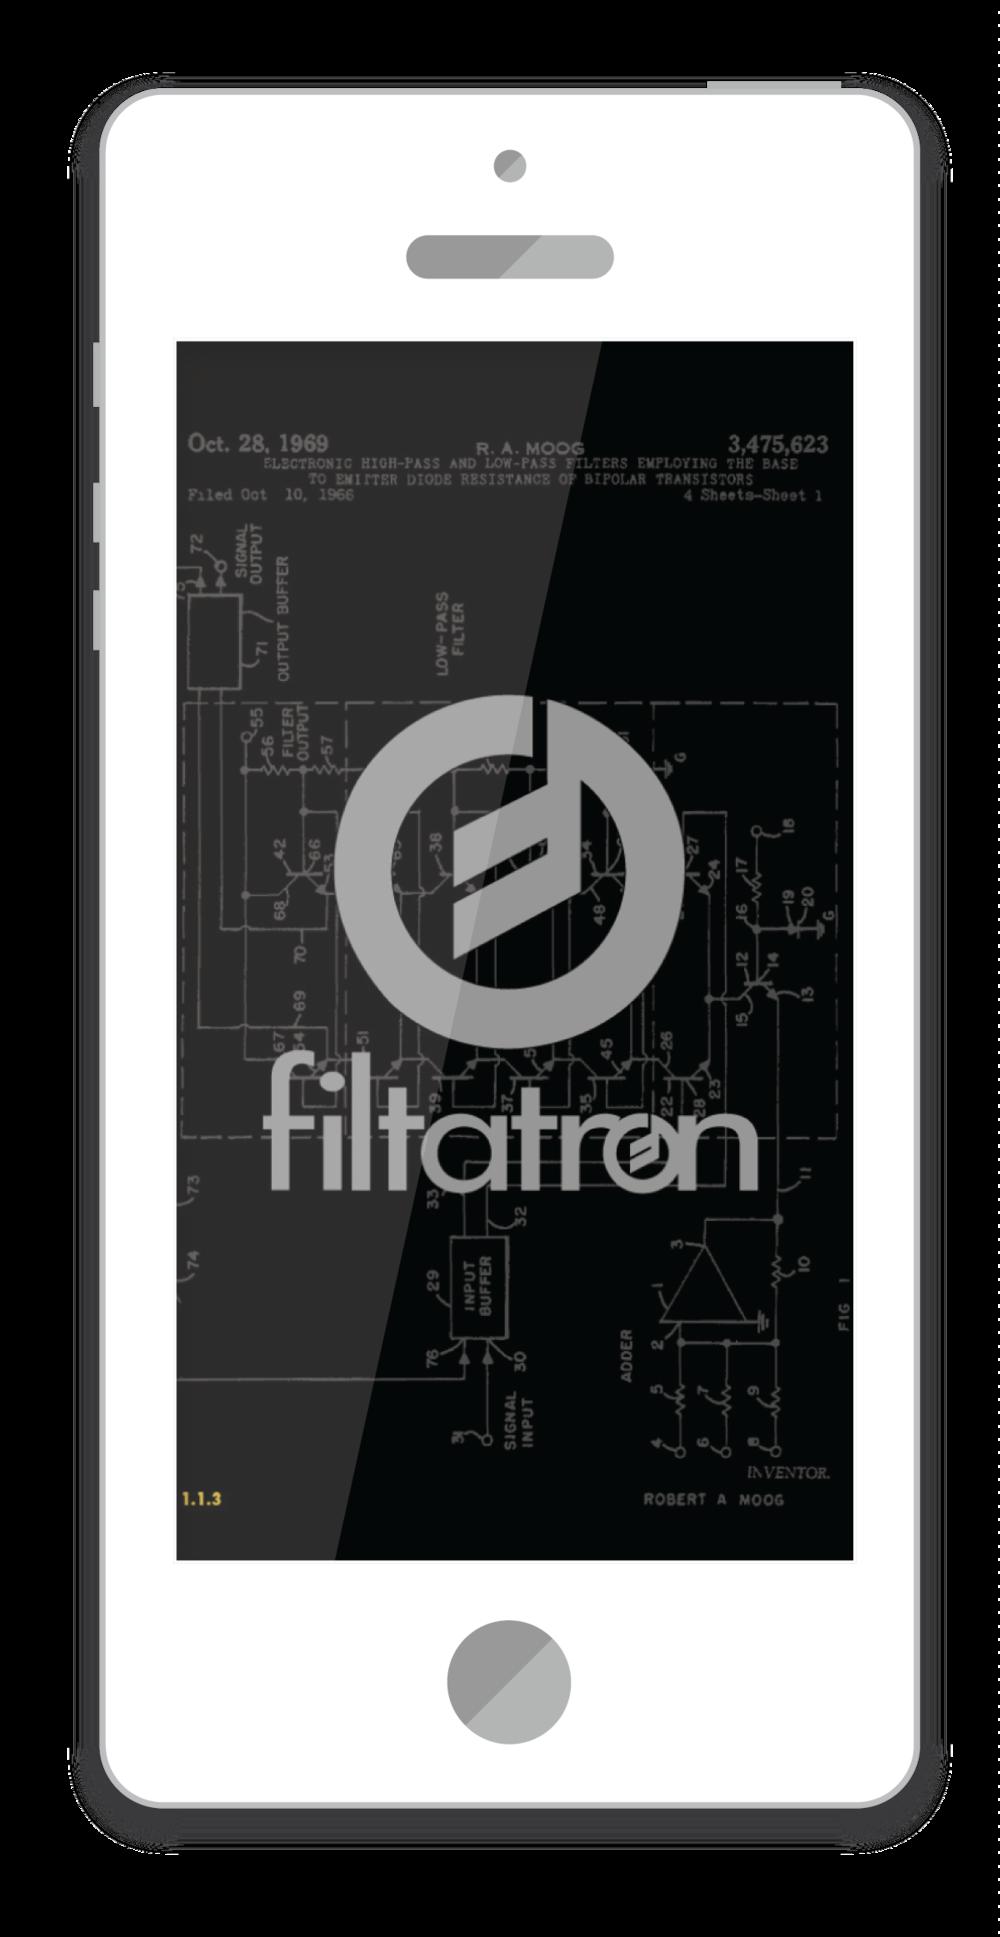 filtatron1.png